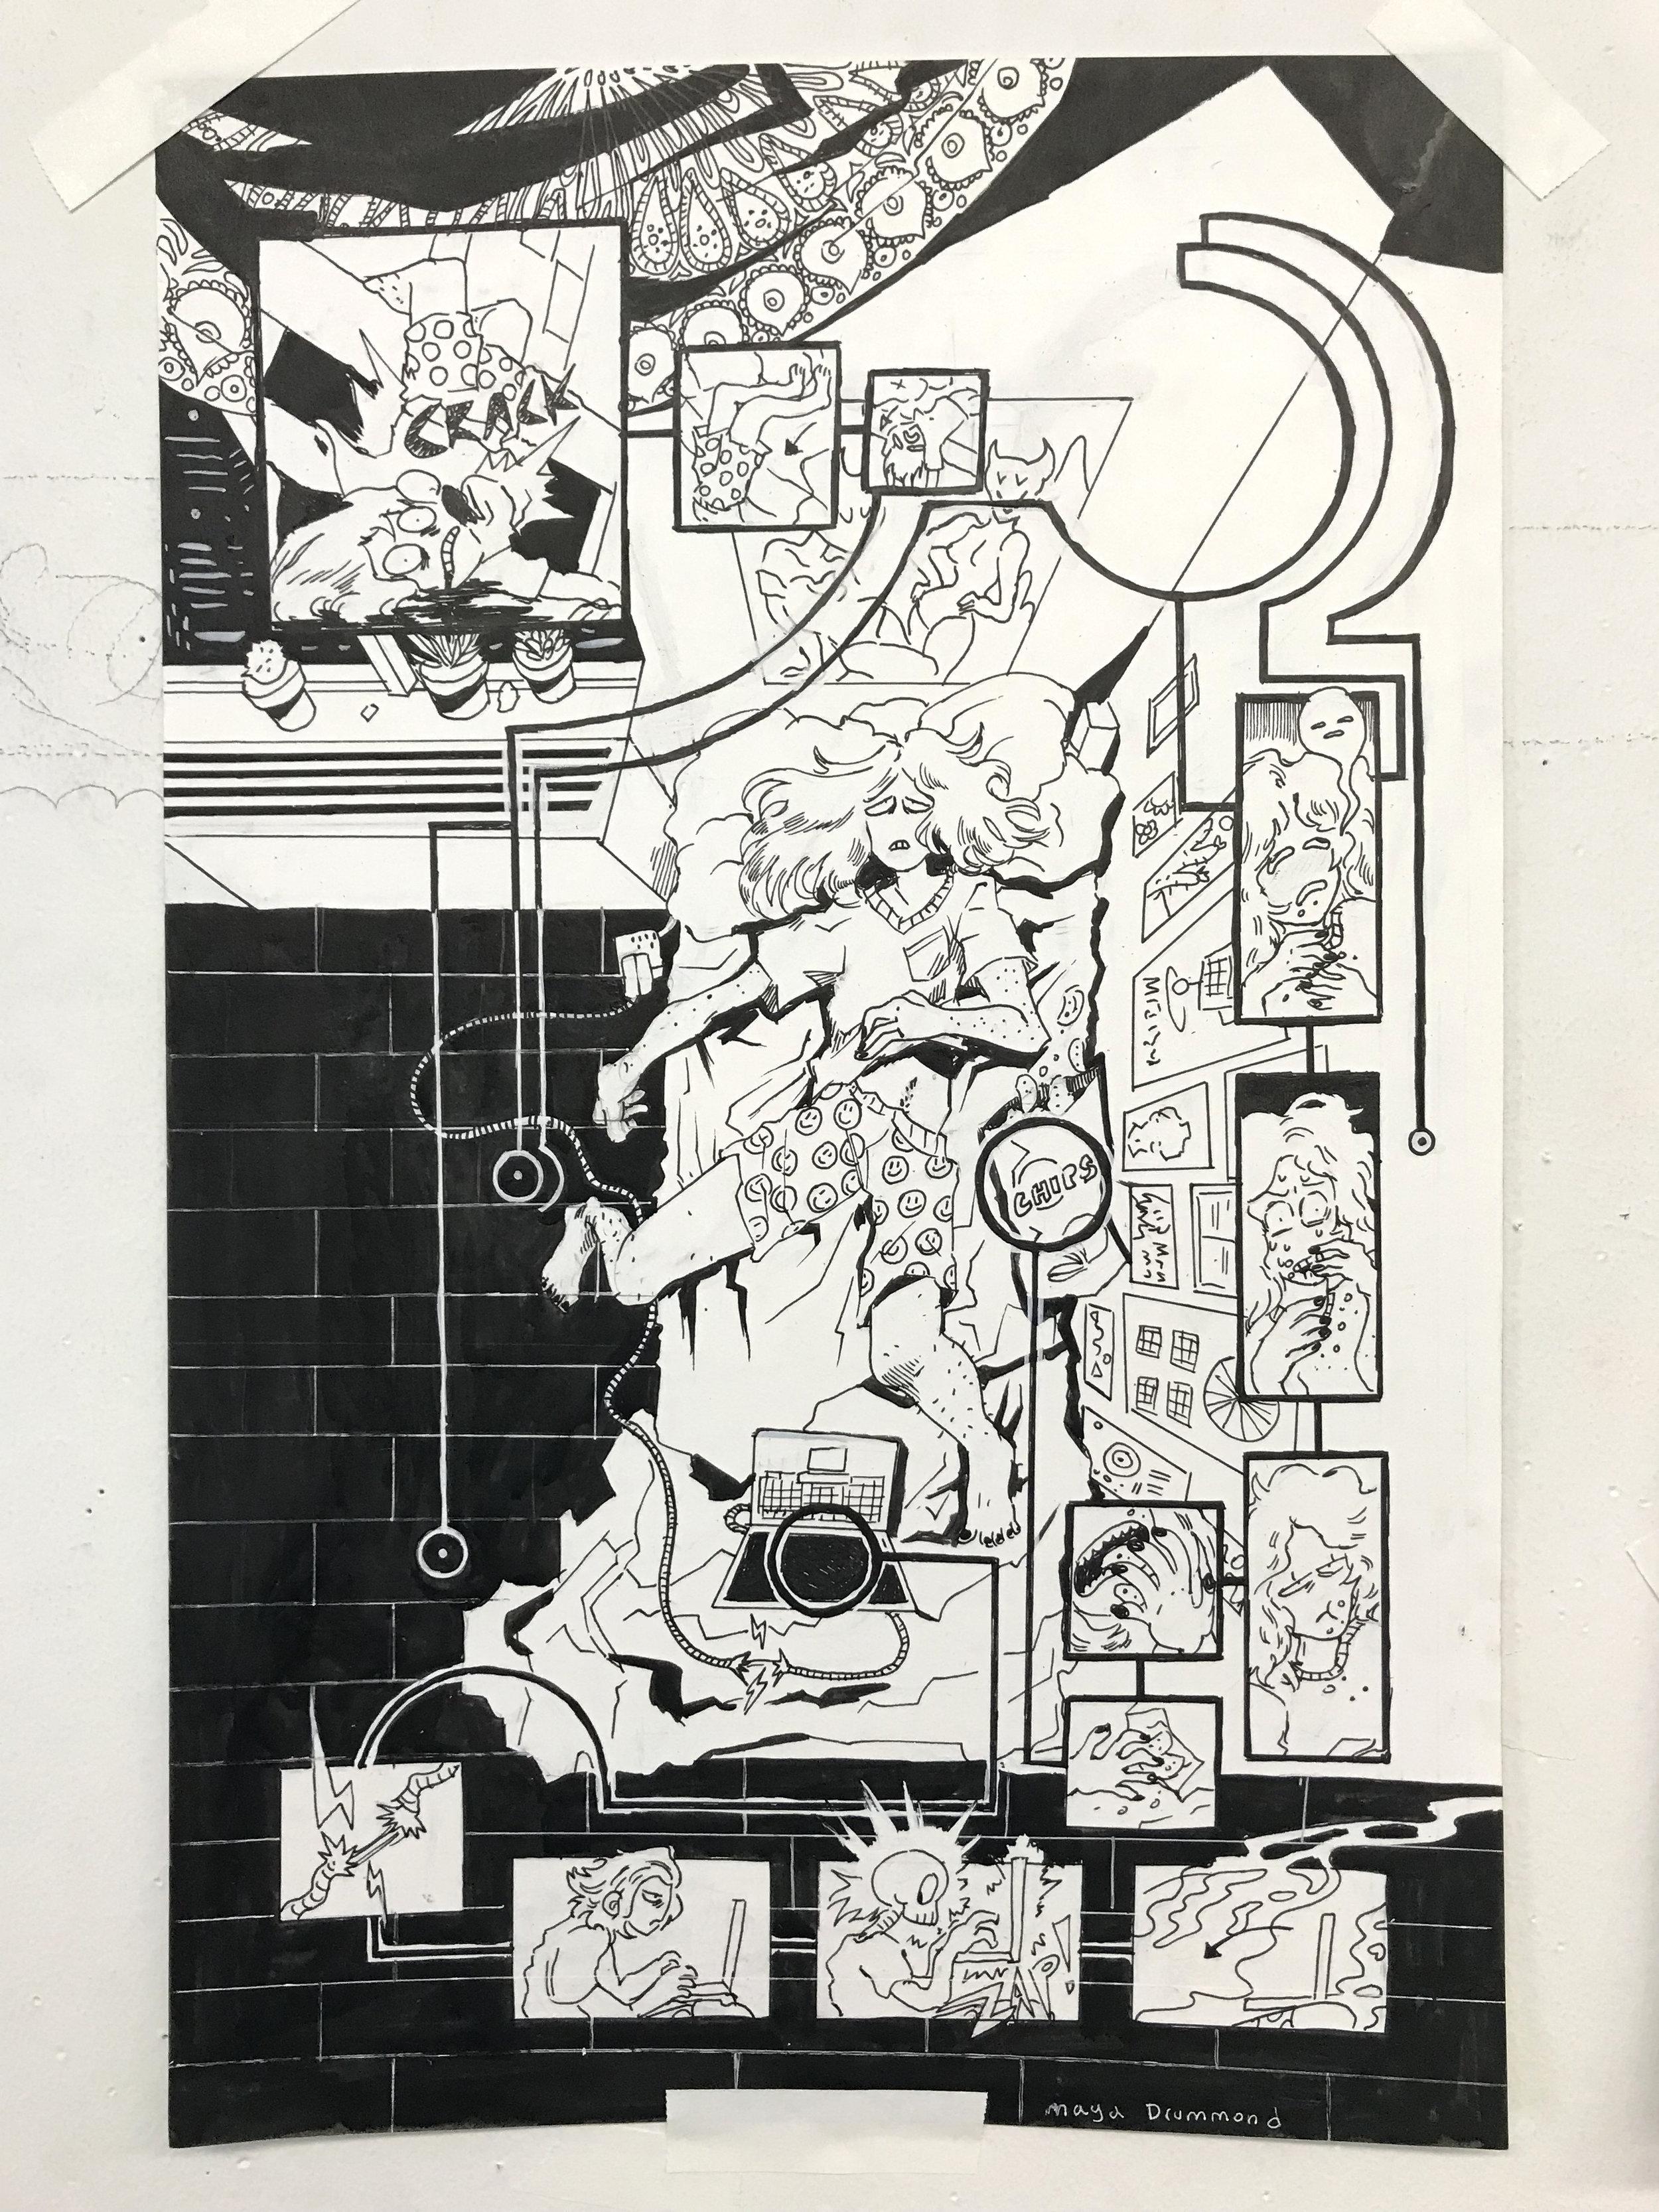 Branching narrative by Maya Drummond, Principles of Cartooning, '18-'19.